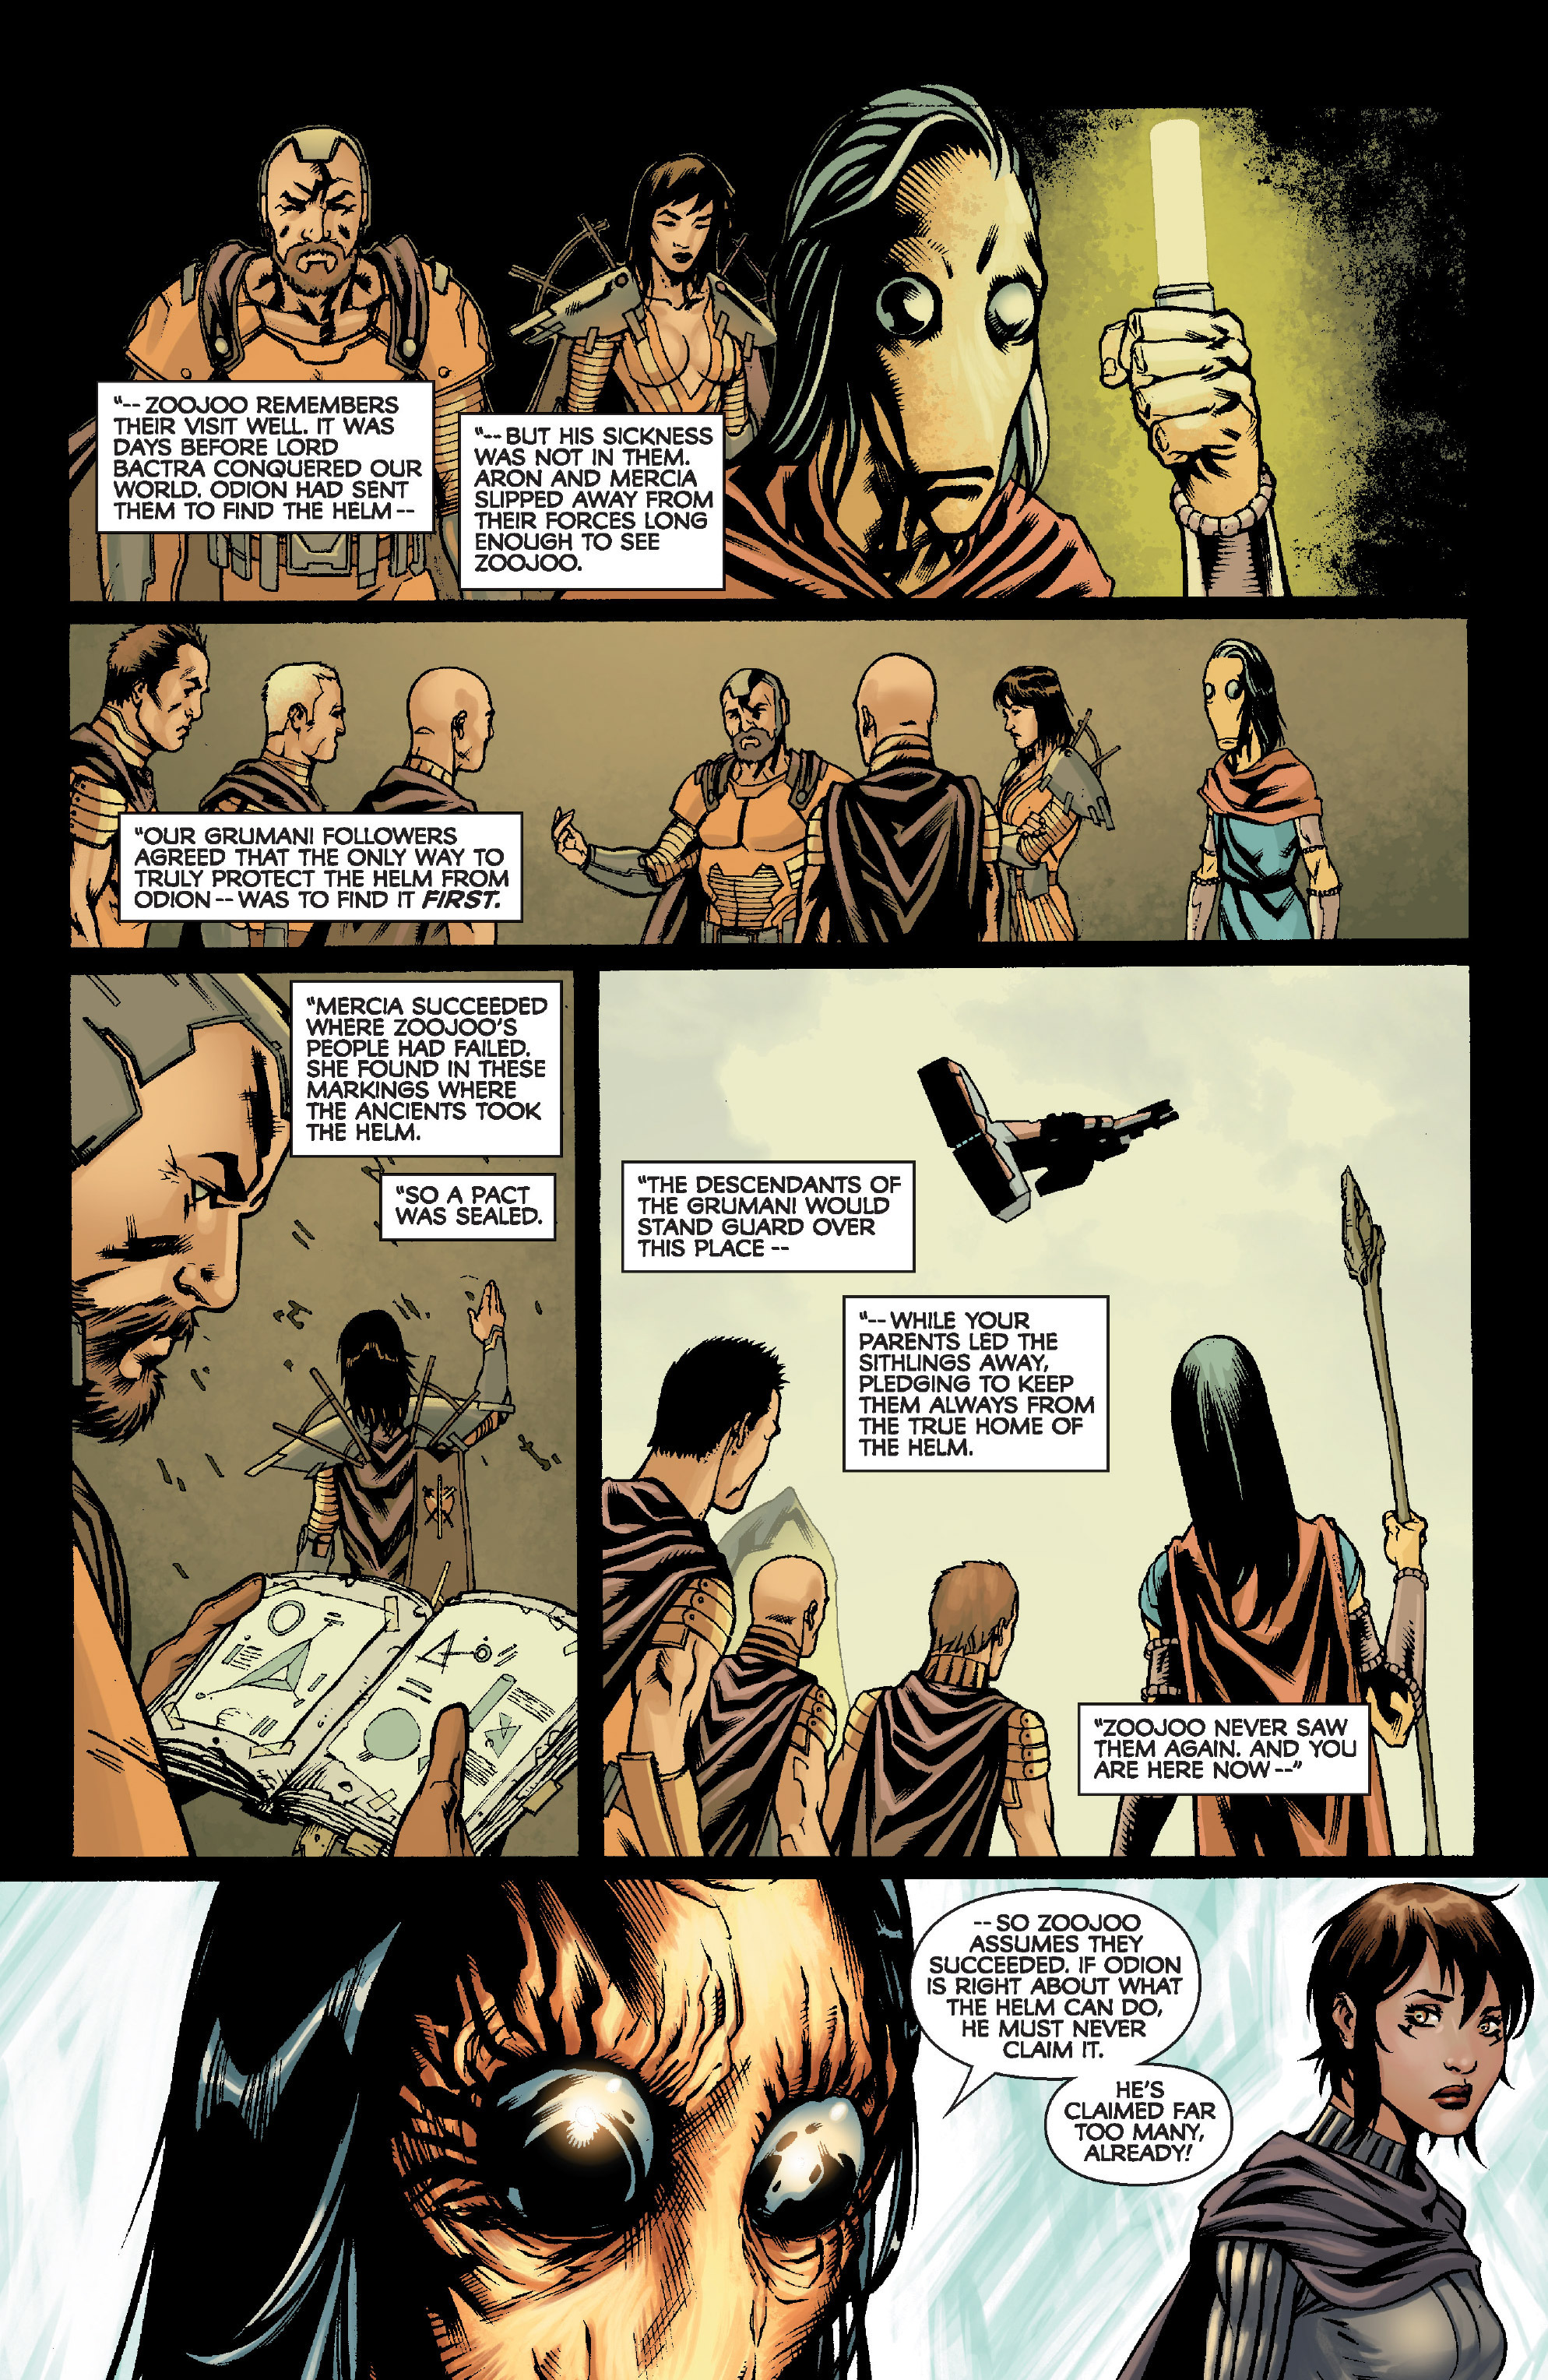 Read online Star Wars: Knight Errant - Escape comic -  Issue #2 - 16